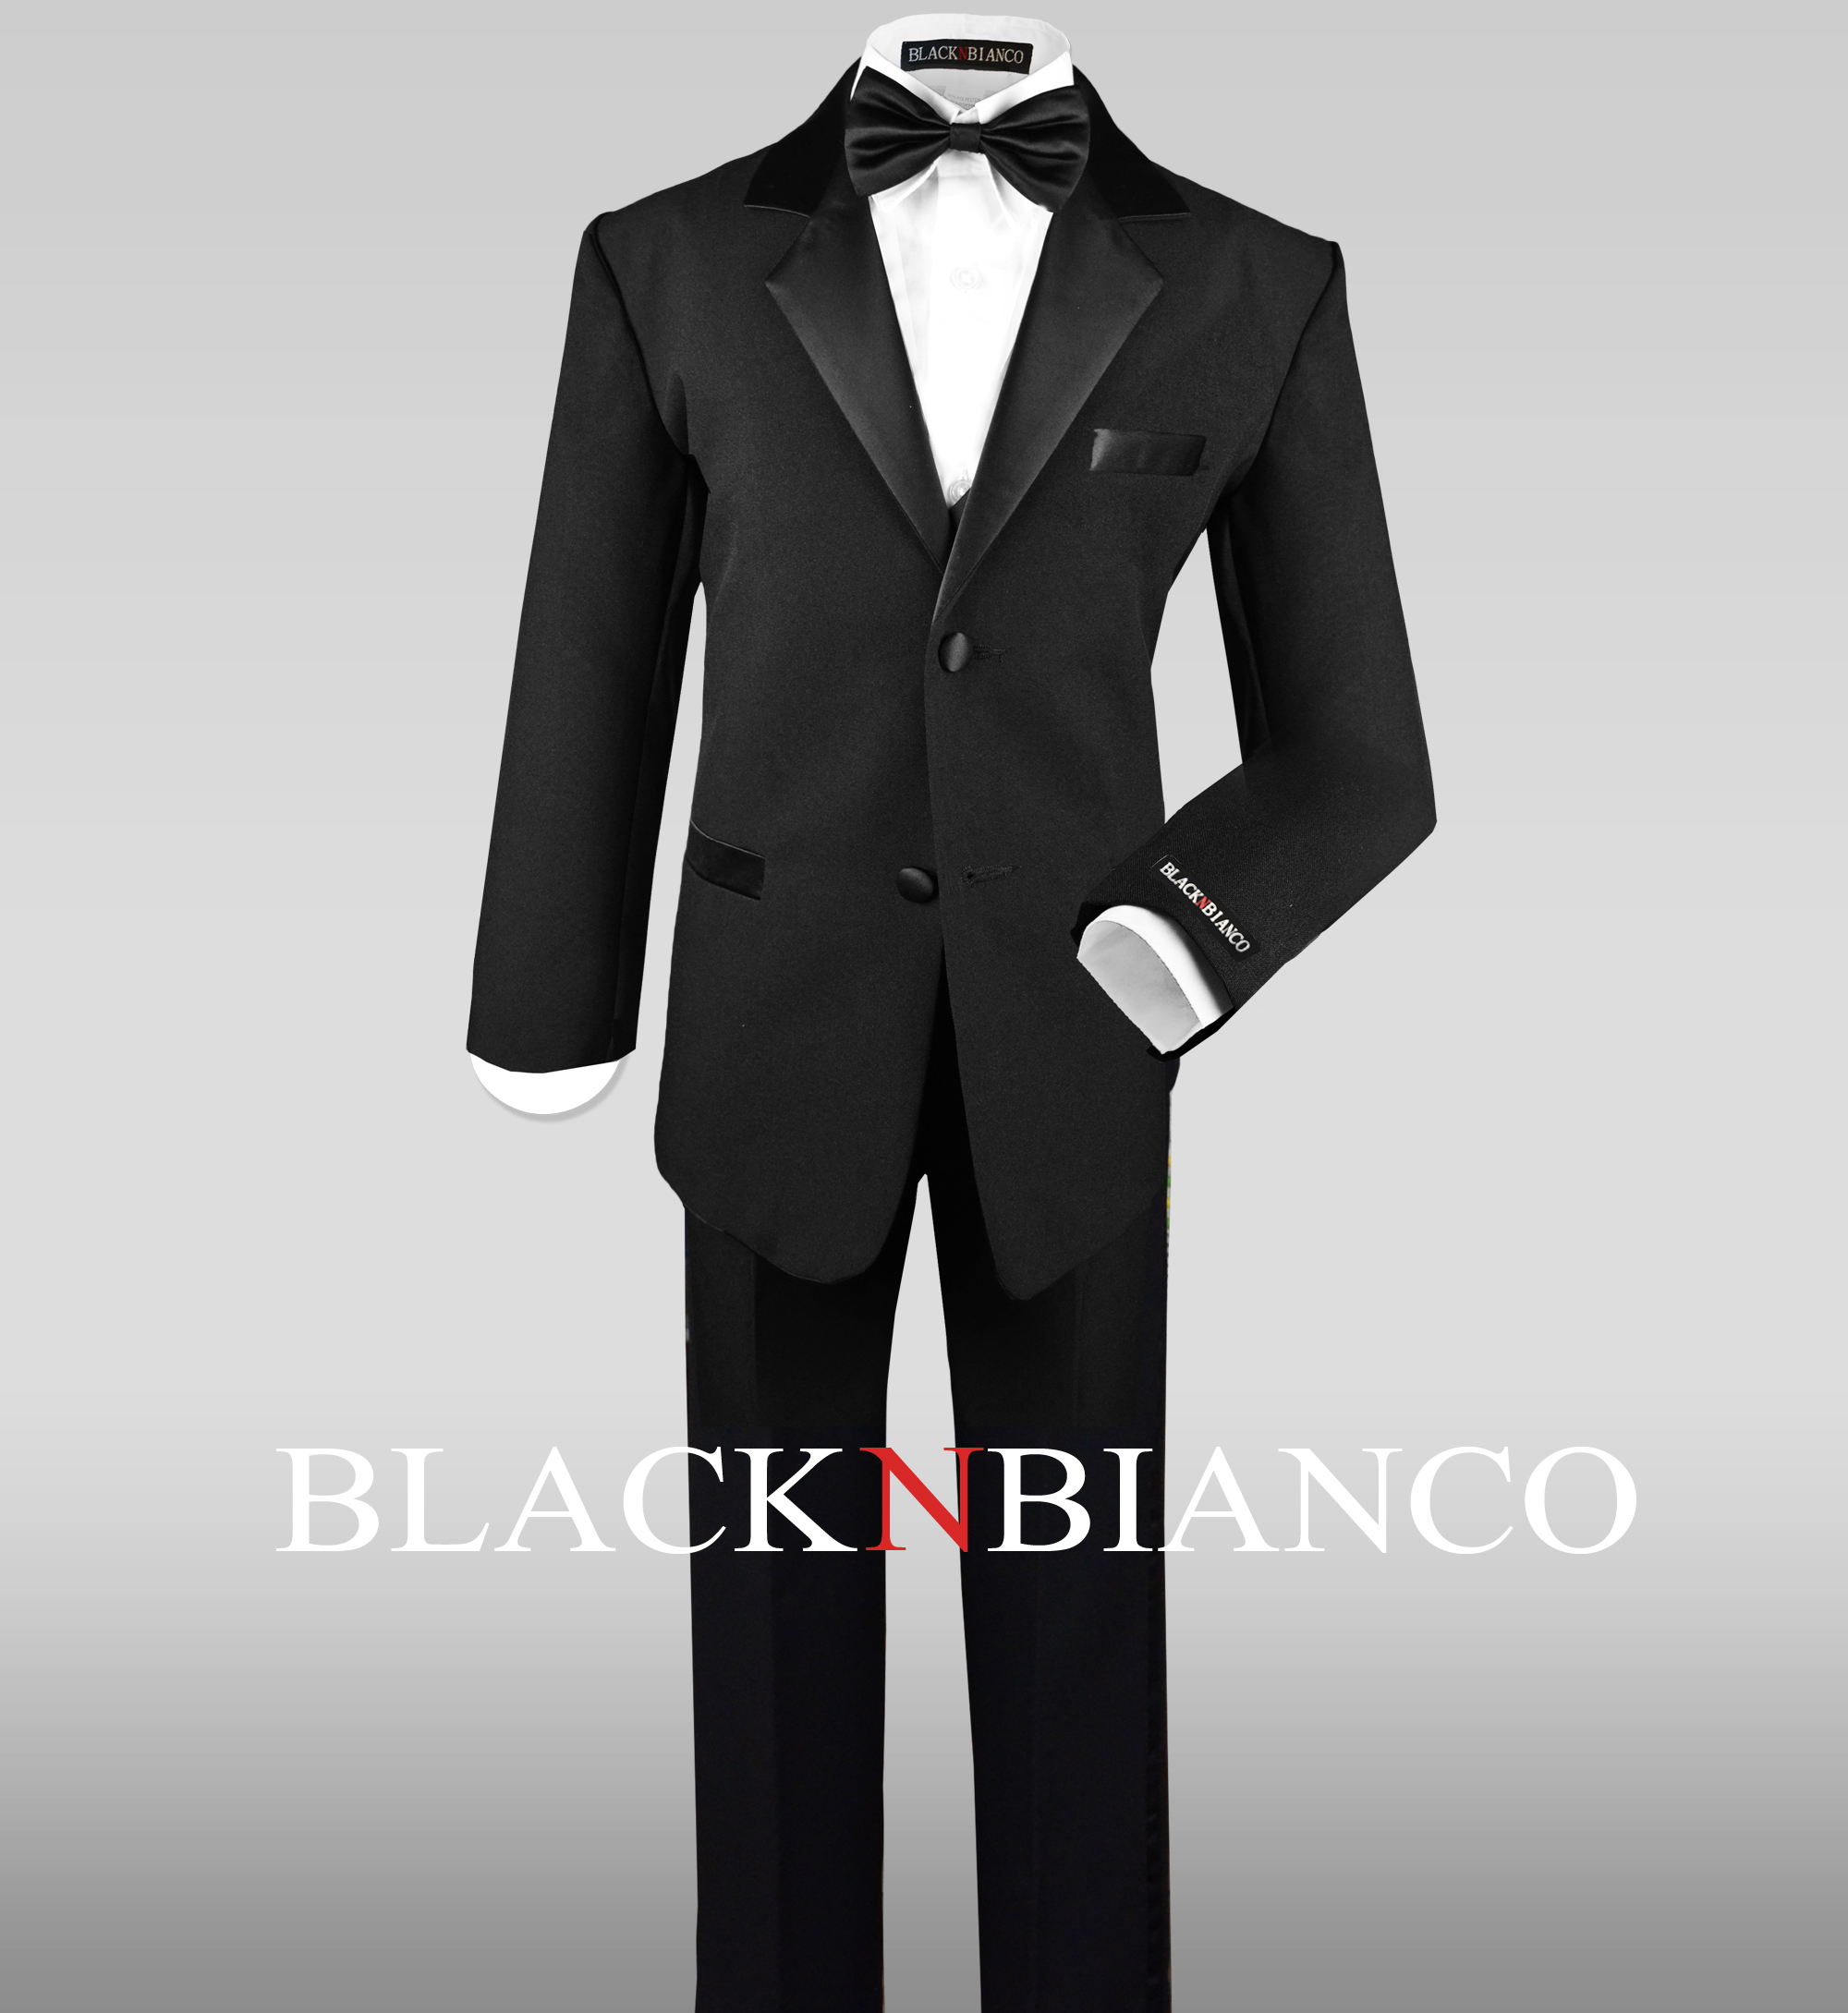 Boys Tuxedo Black N Bianco Blog